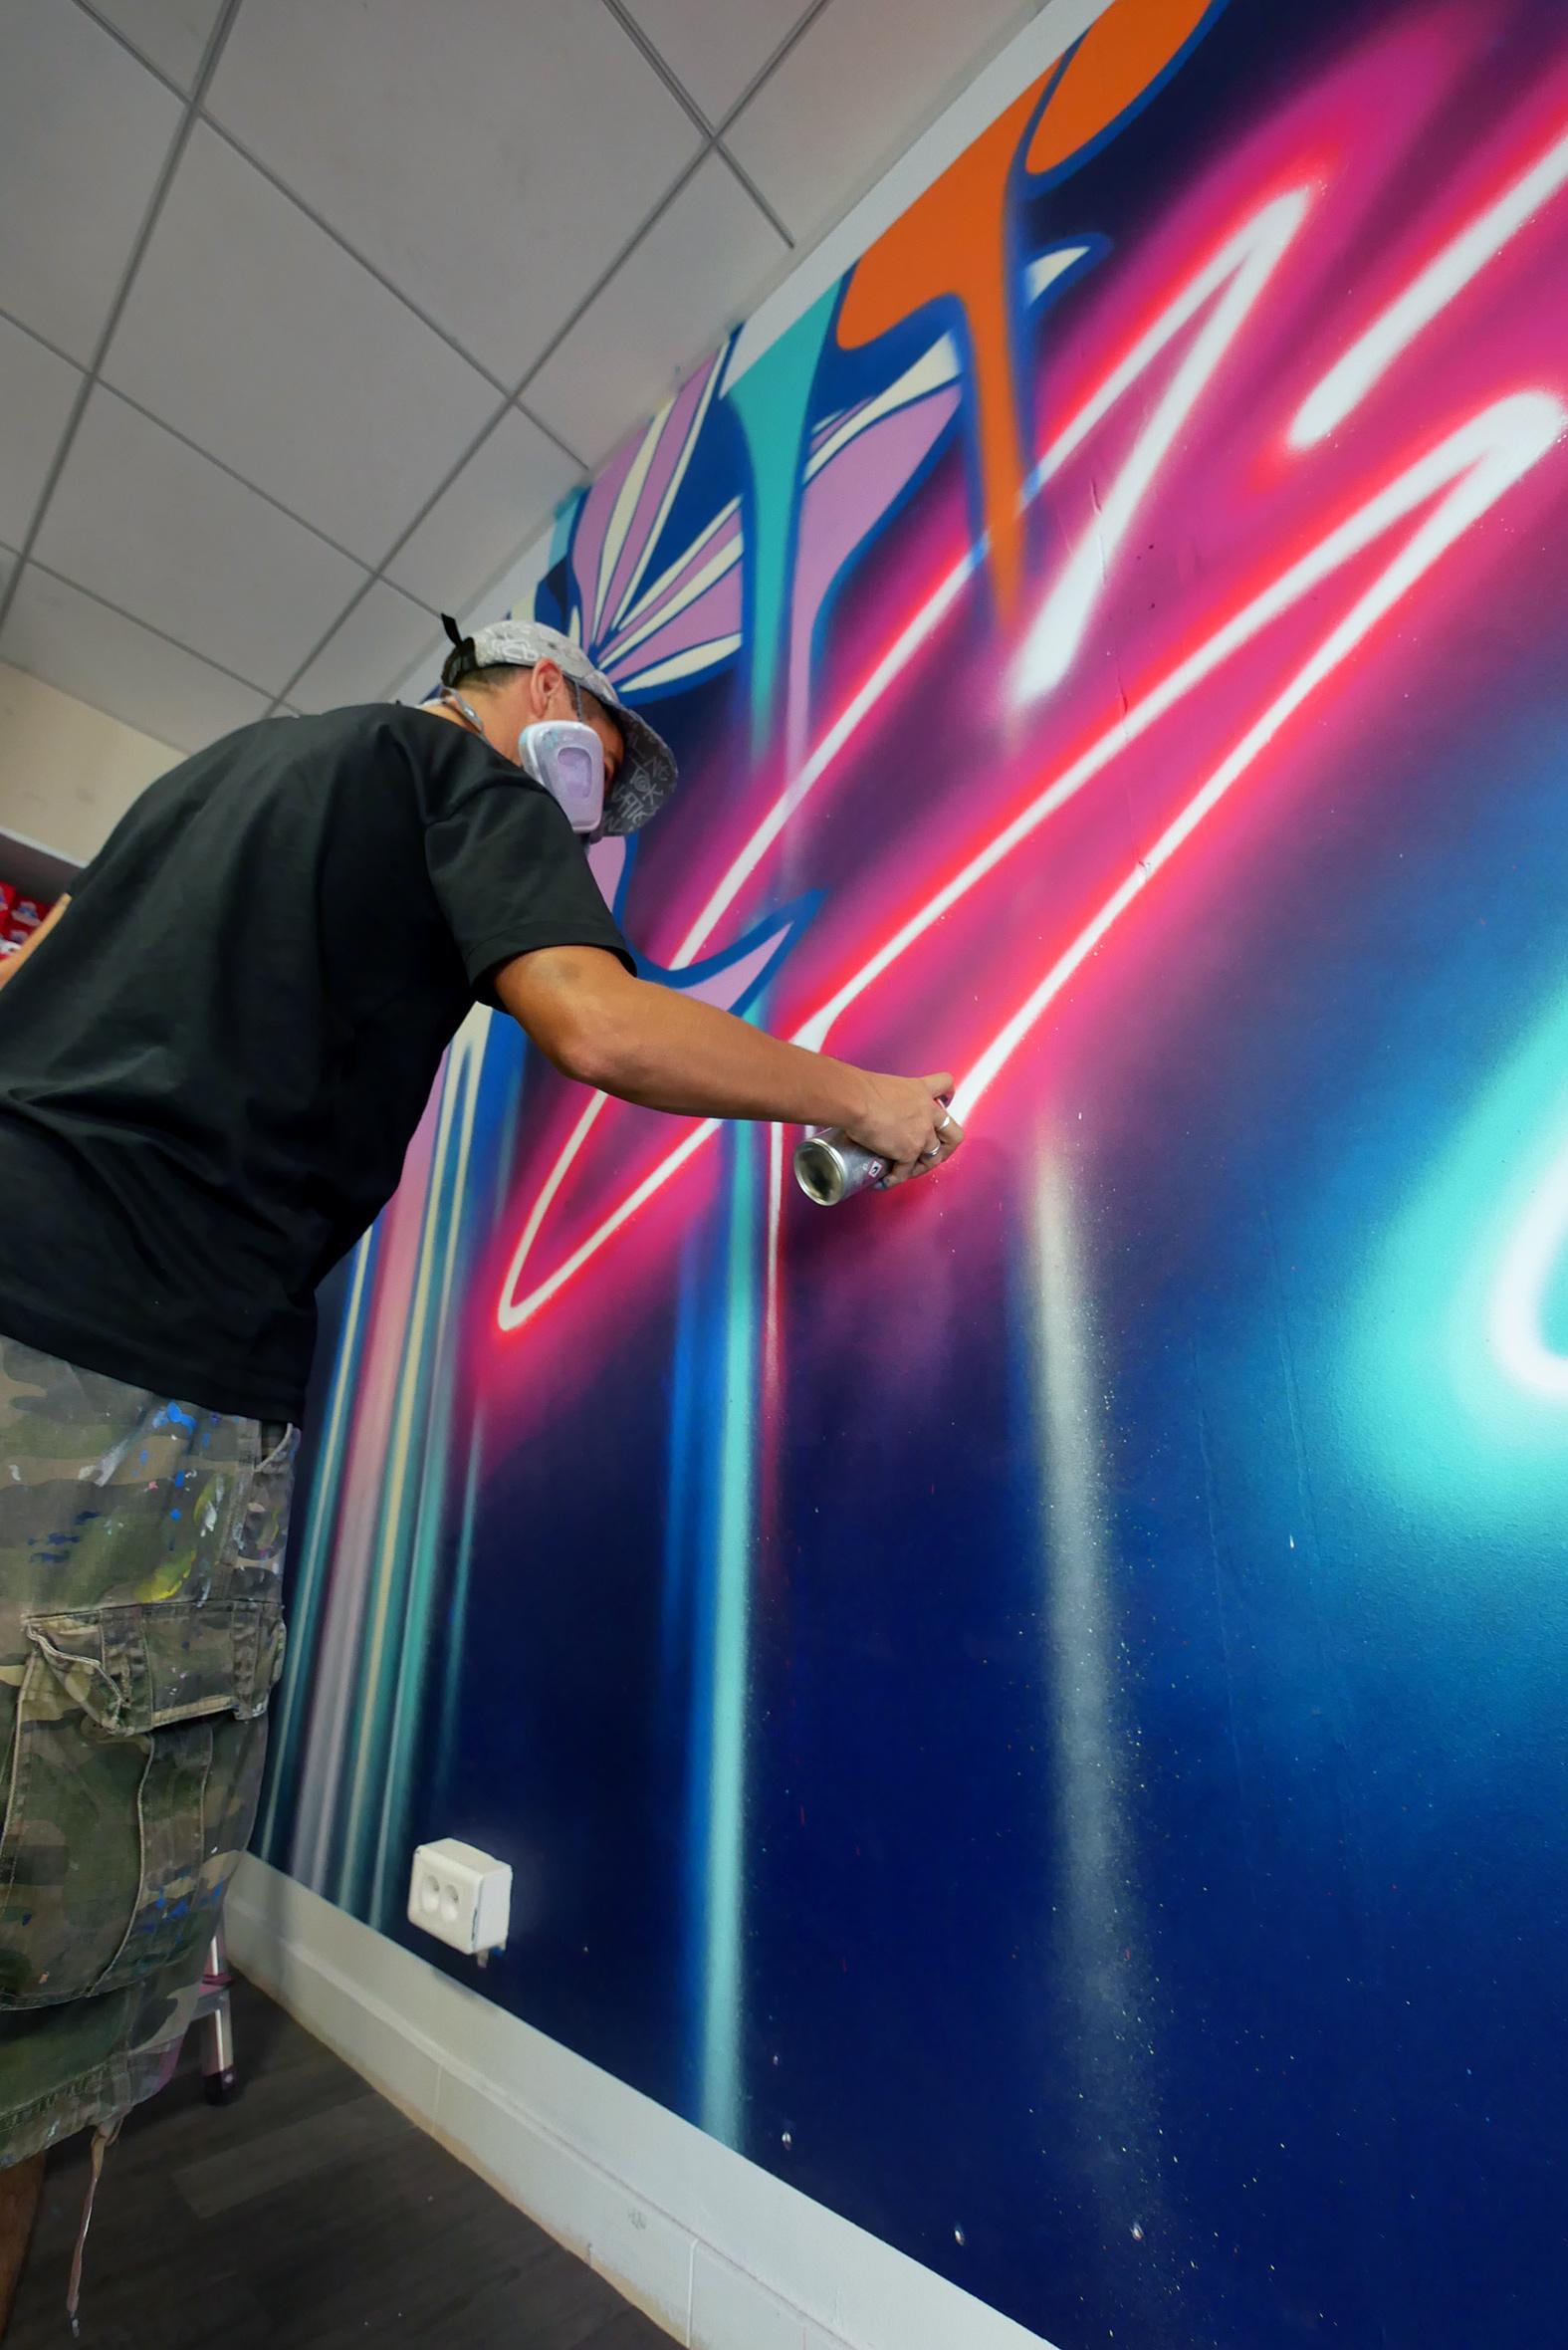 Nerone-street-shop-graffiti-5